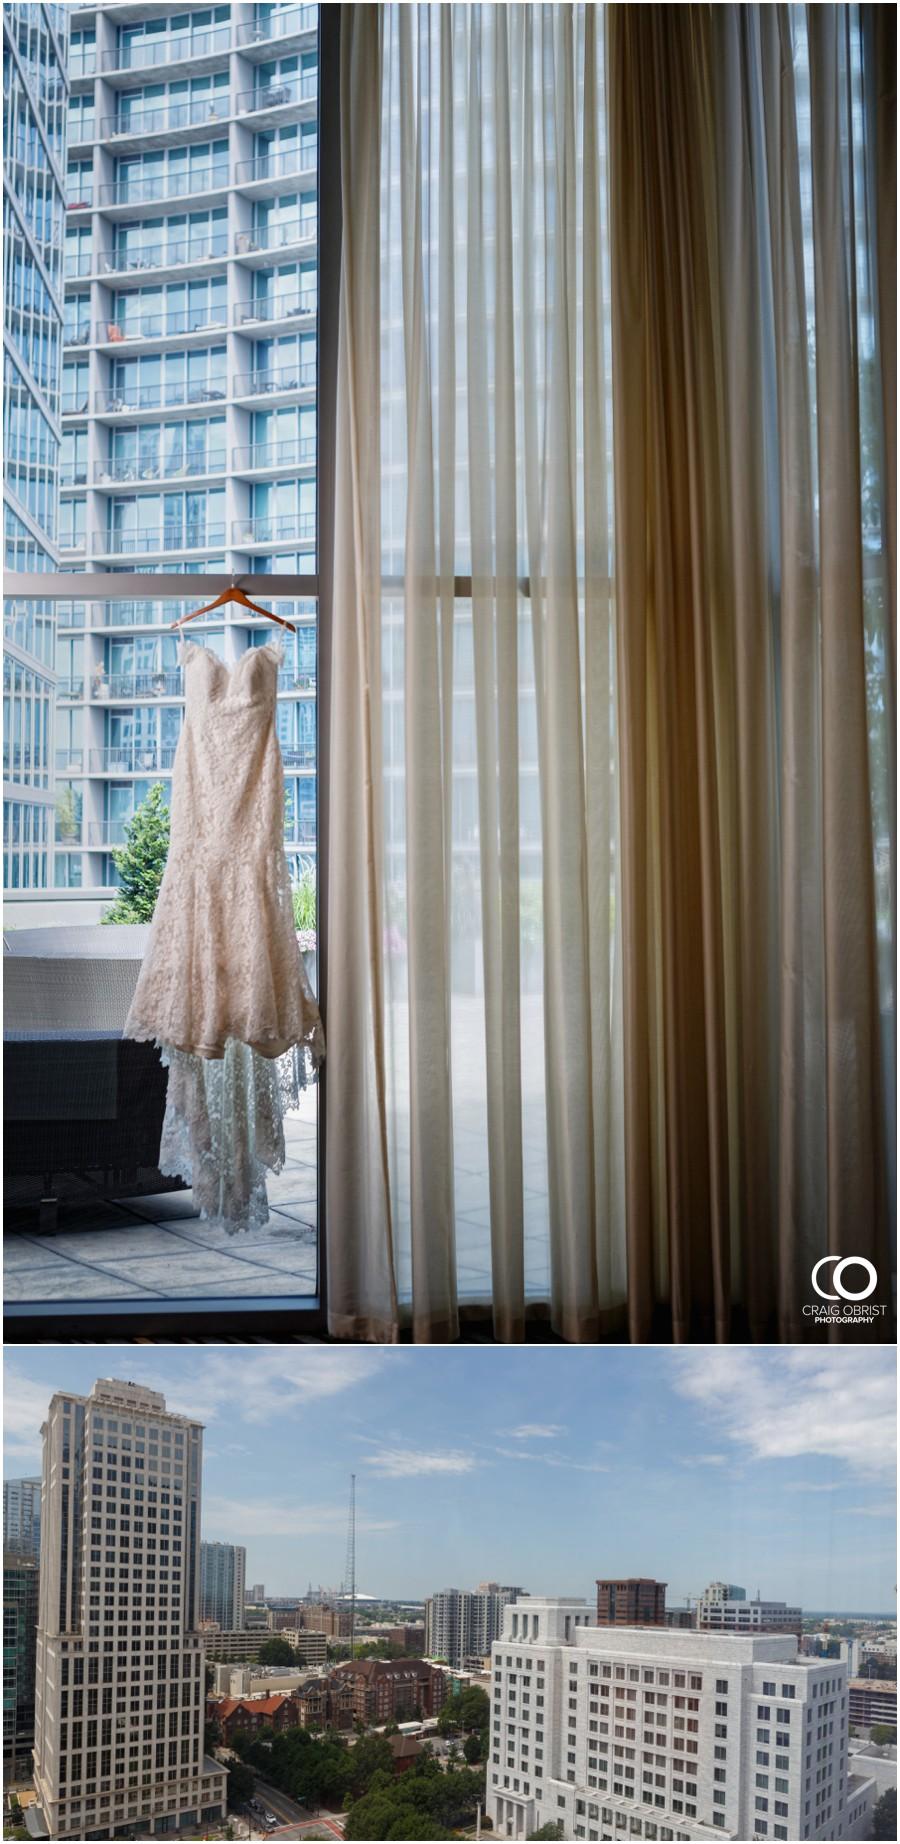 Wimbish-House-Loews-hotel-wedding-portraits-atlanta_0006.jpg